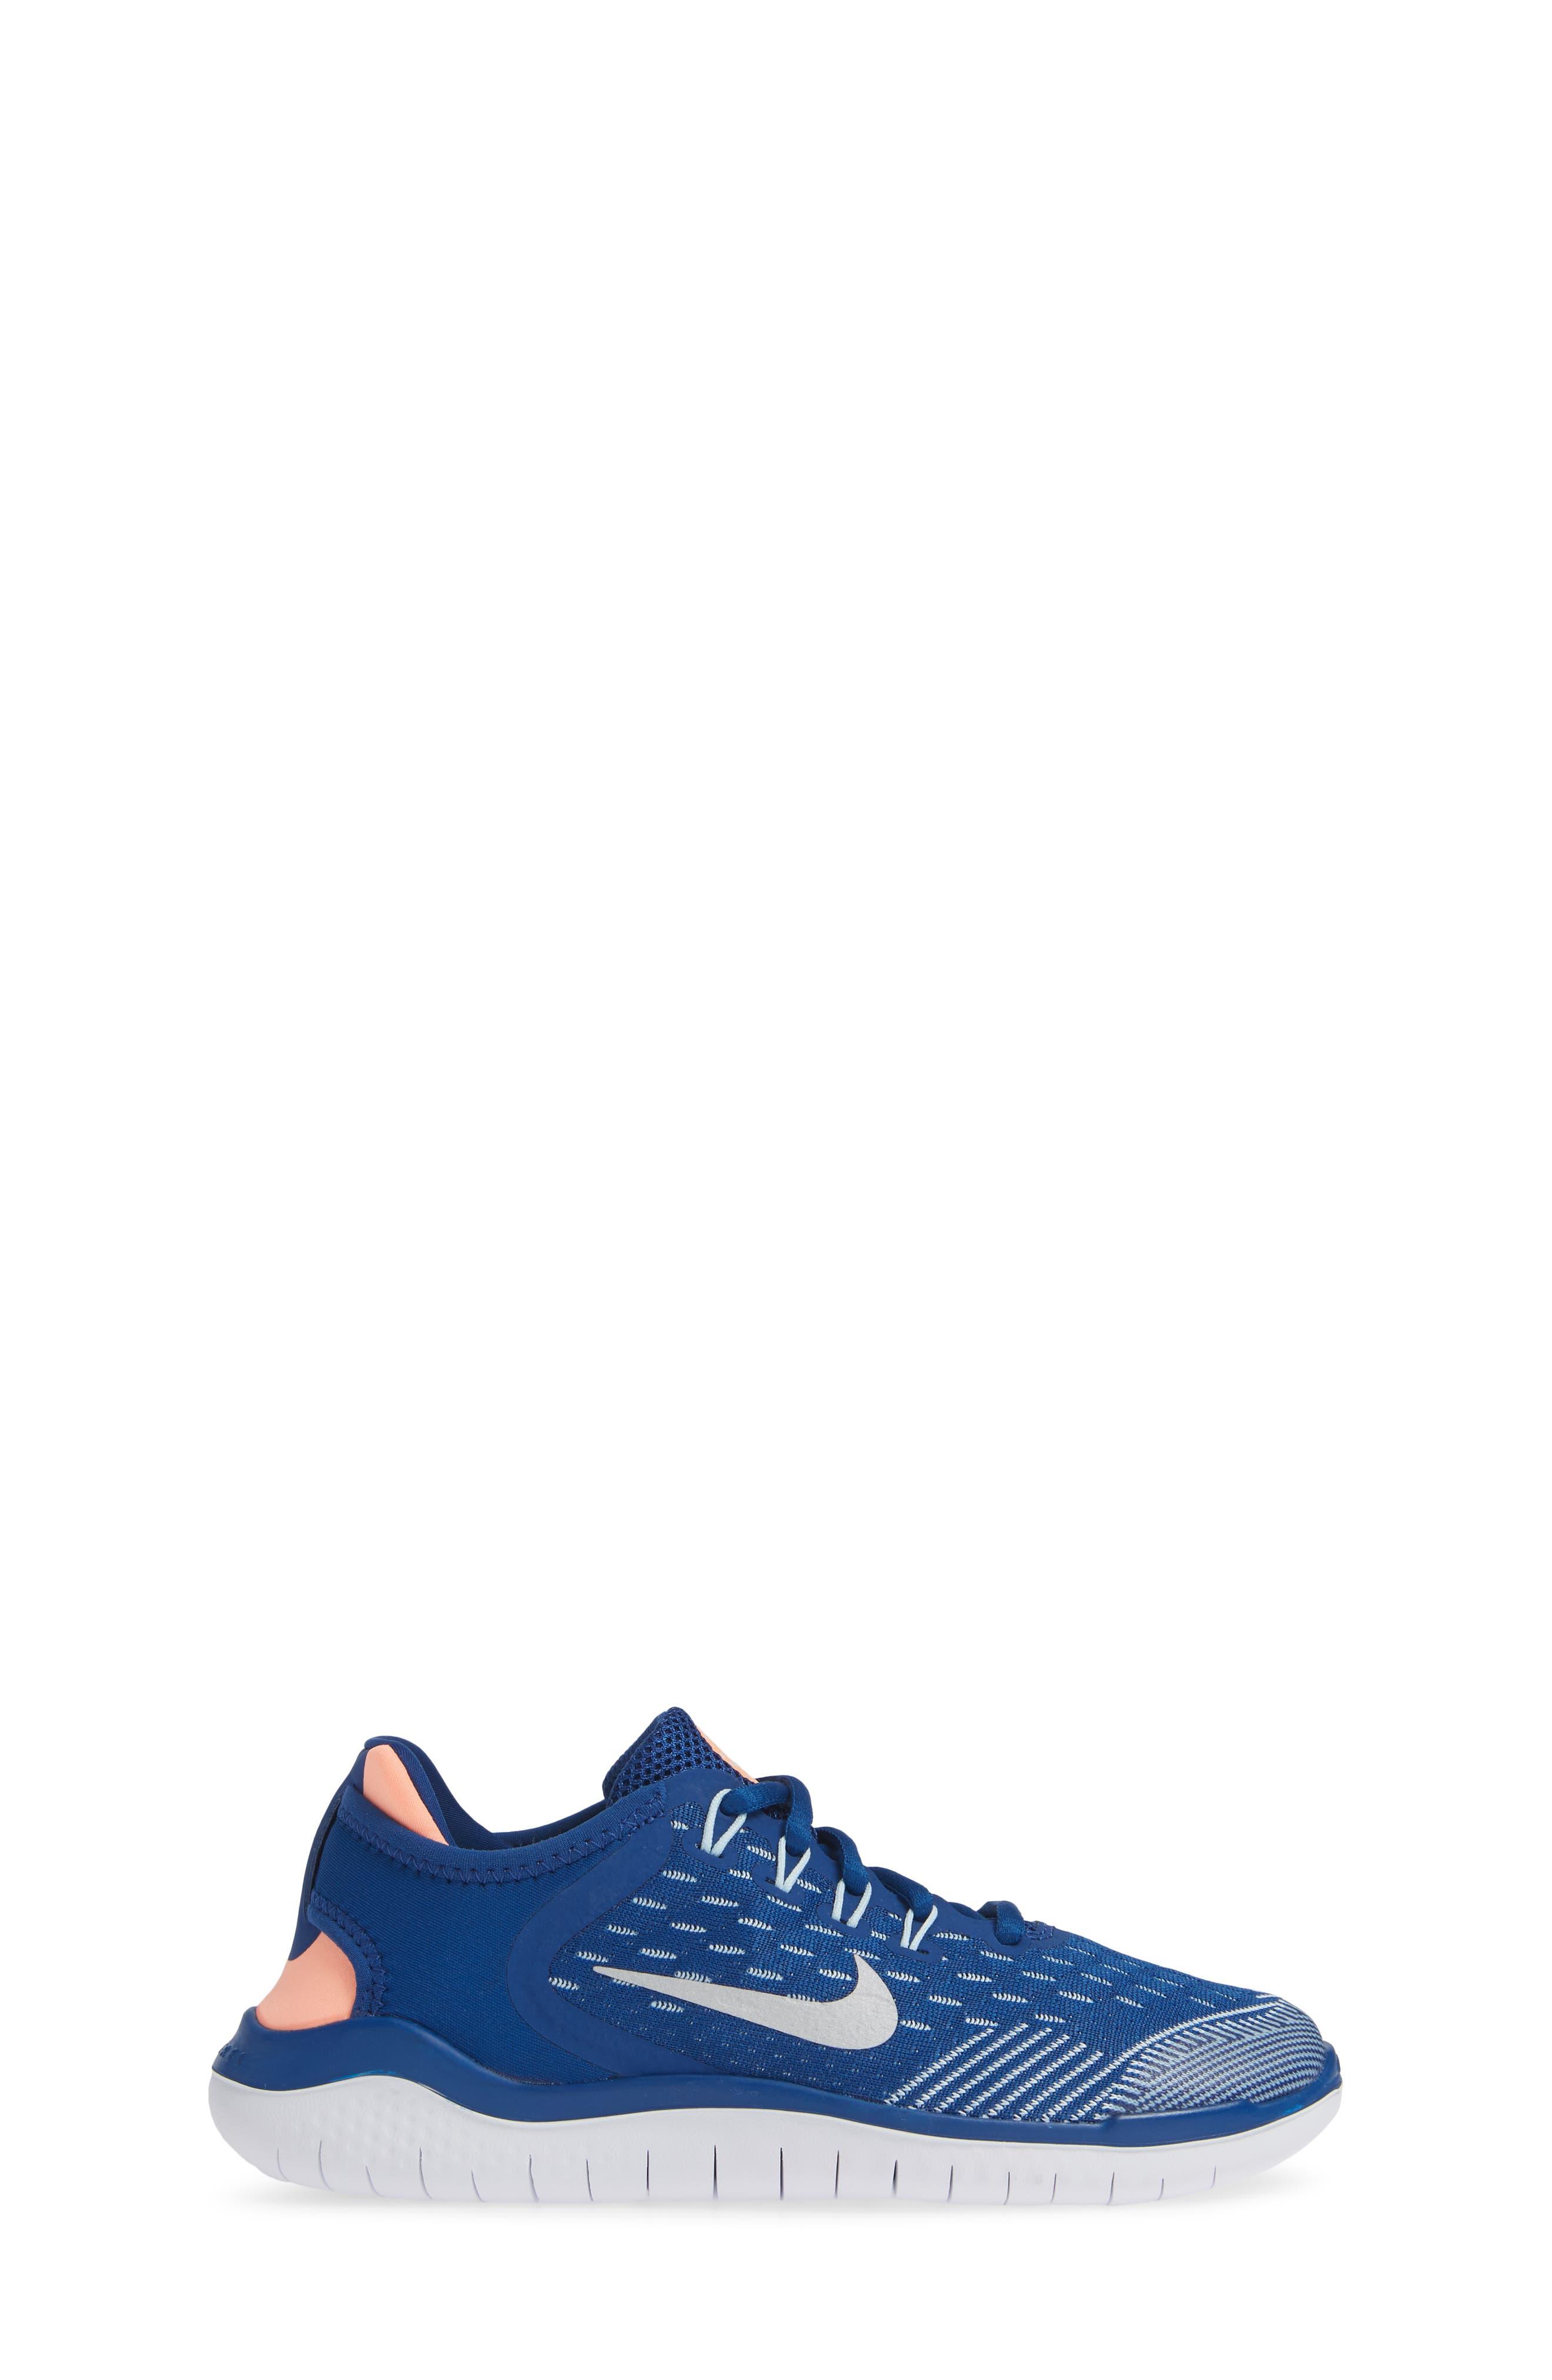 Free RN 2018 Running Shoe,                             Alternate thumbnail 3, color,                             GYM BLUE/ METALLIC SILVER